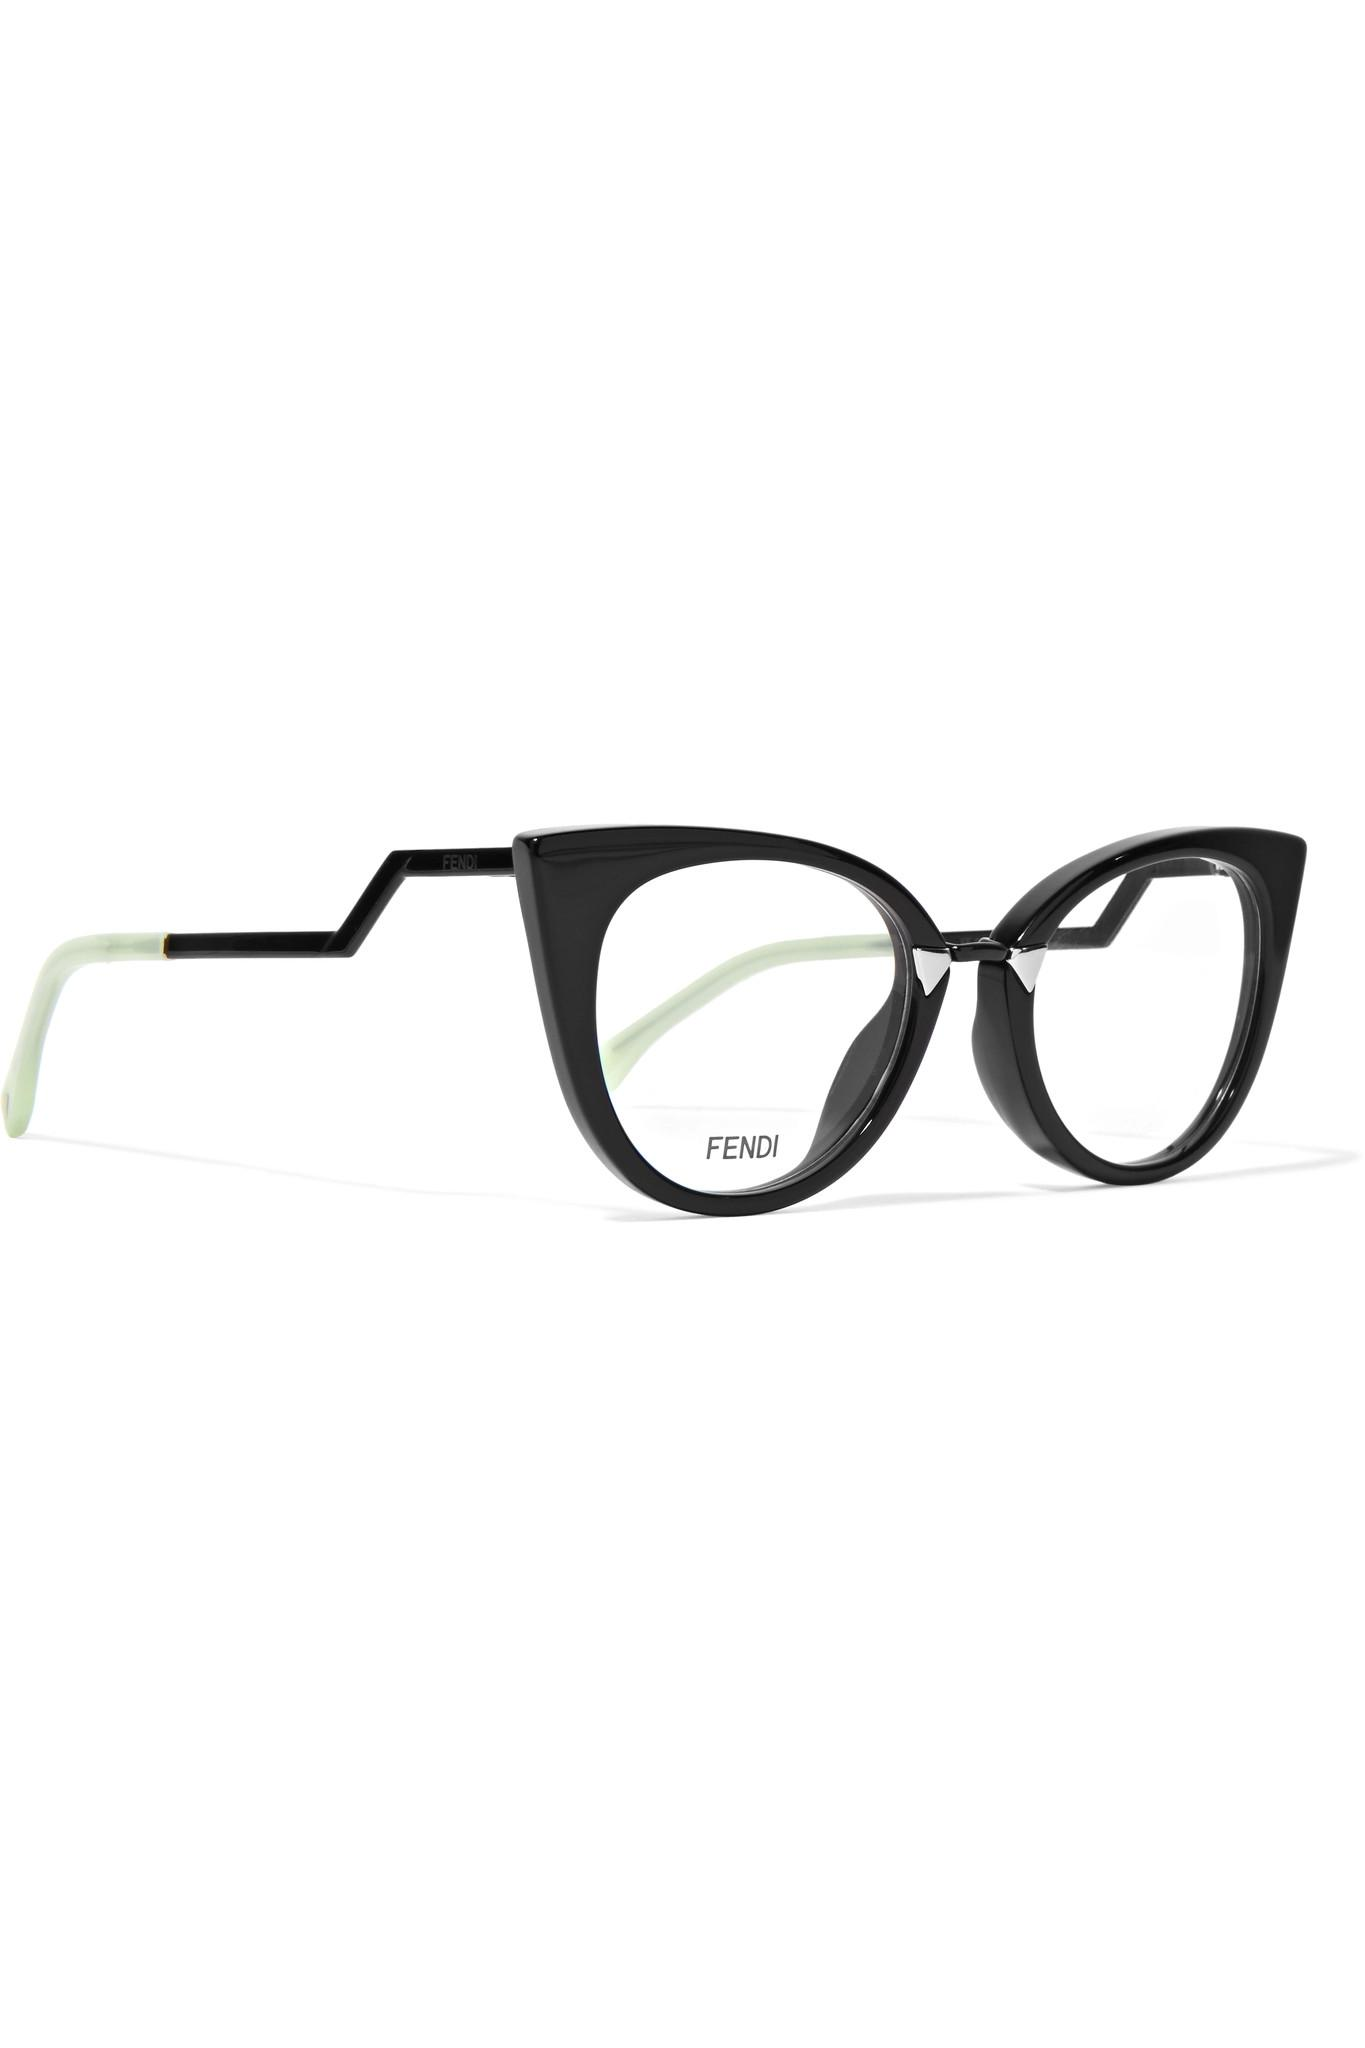 e9ff6fabacd Lyst - Fendi Cat-eye Acetate And Silver-tone Optical Glasses in Black